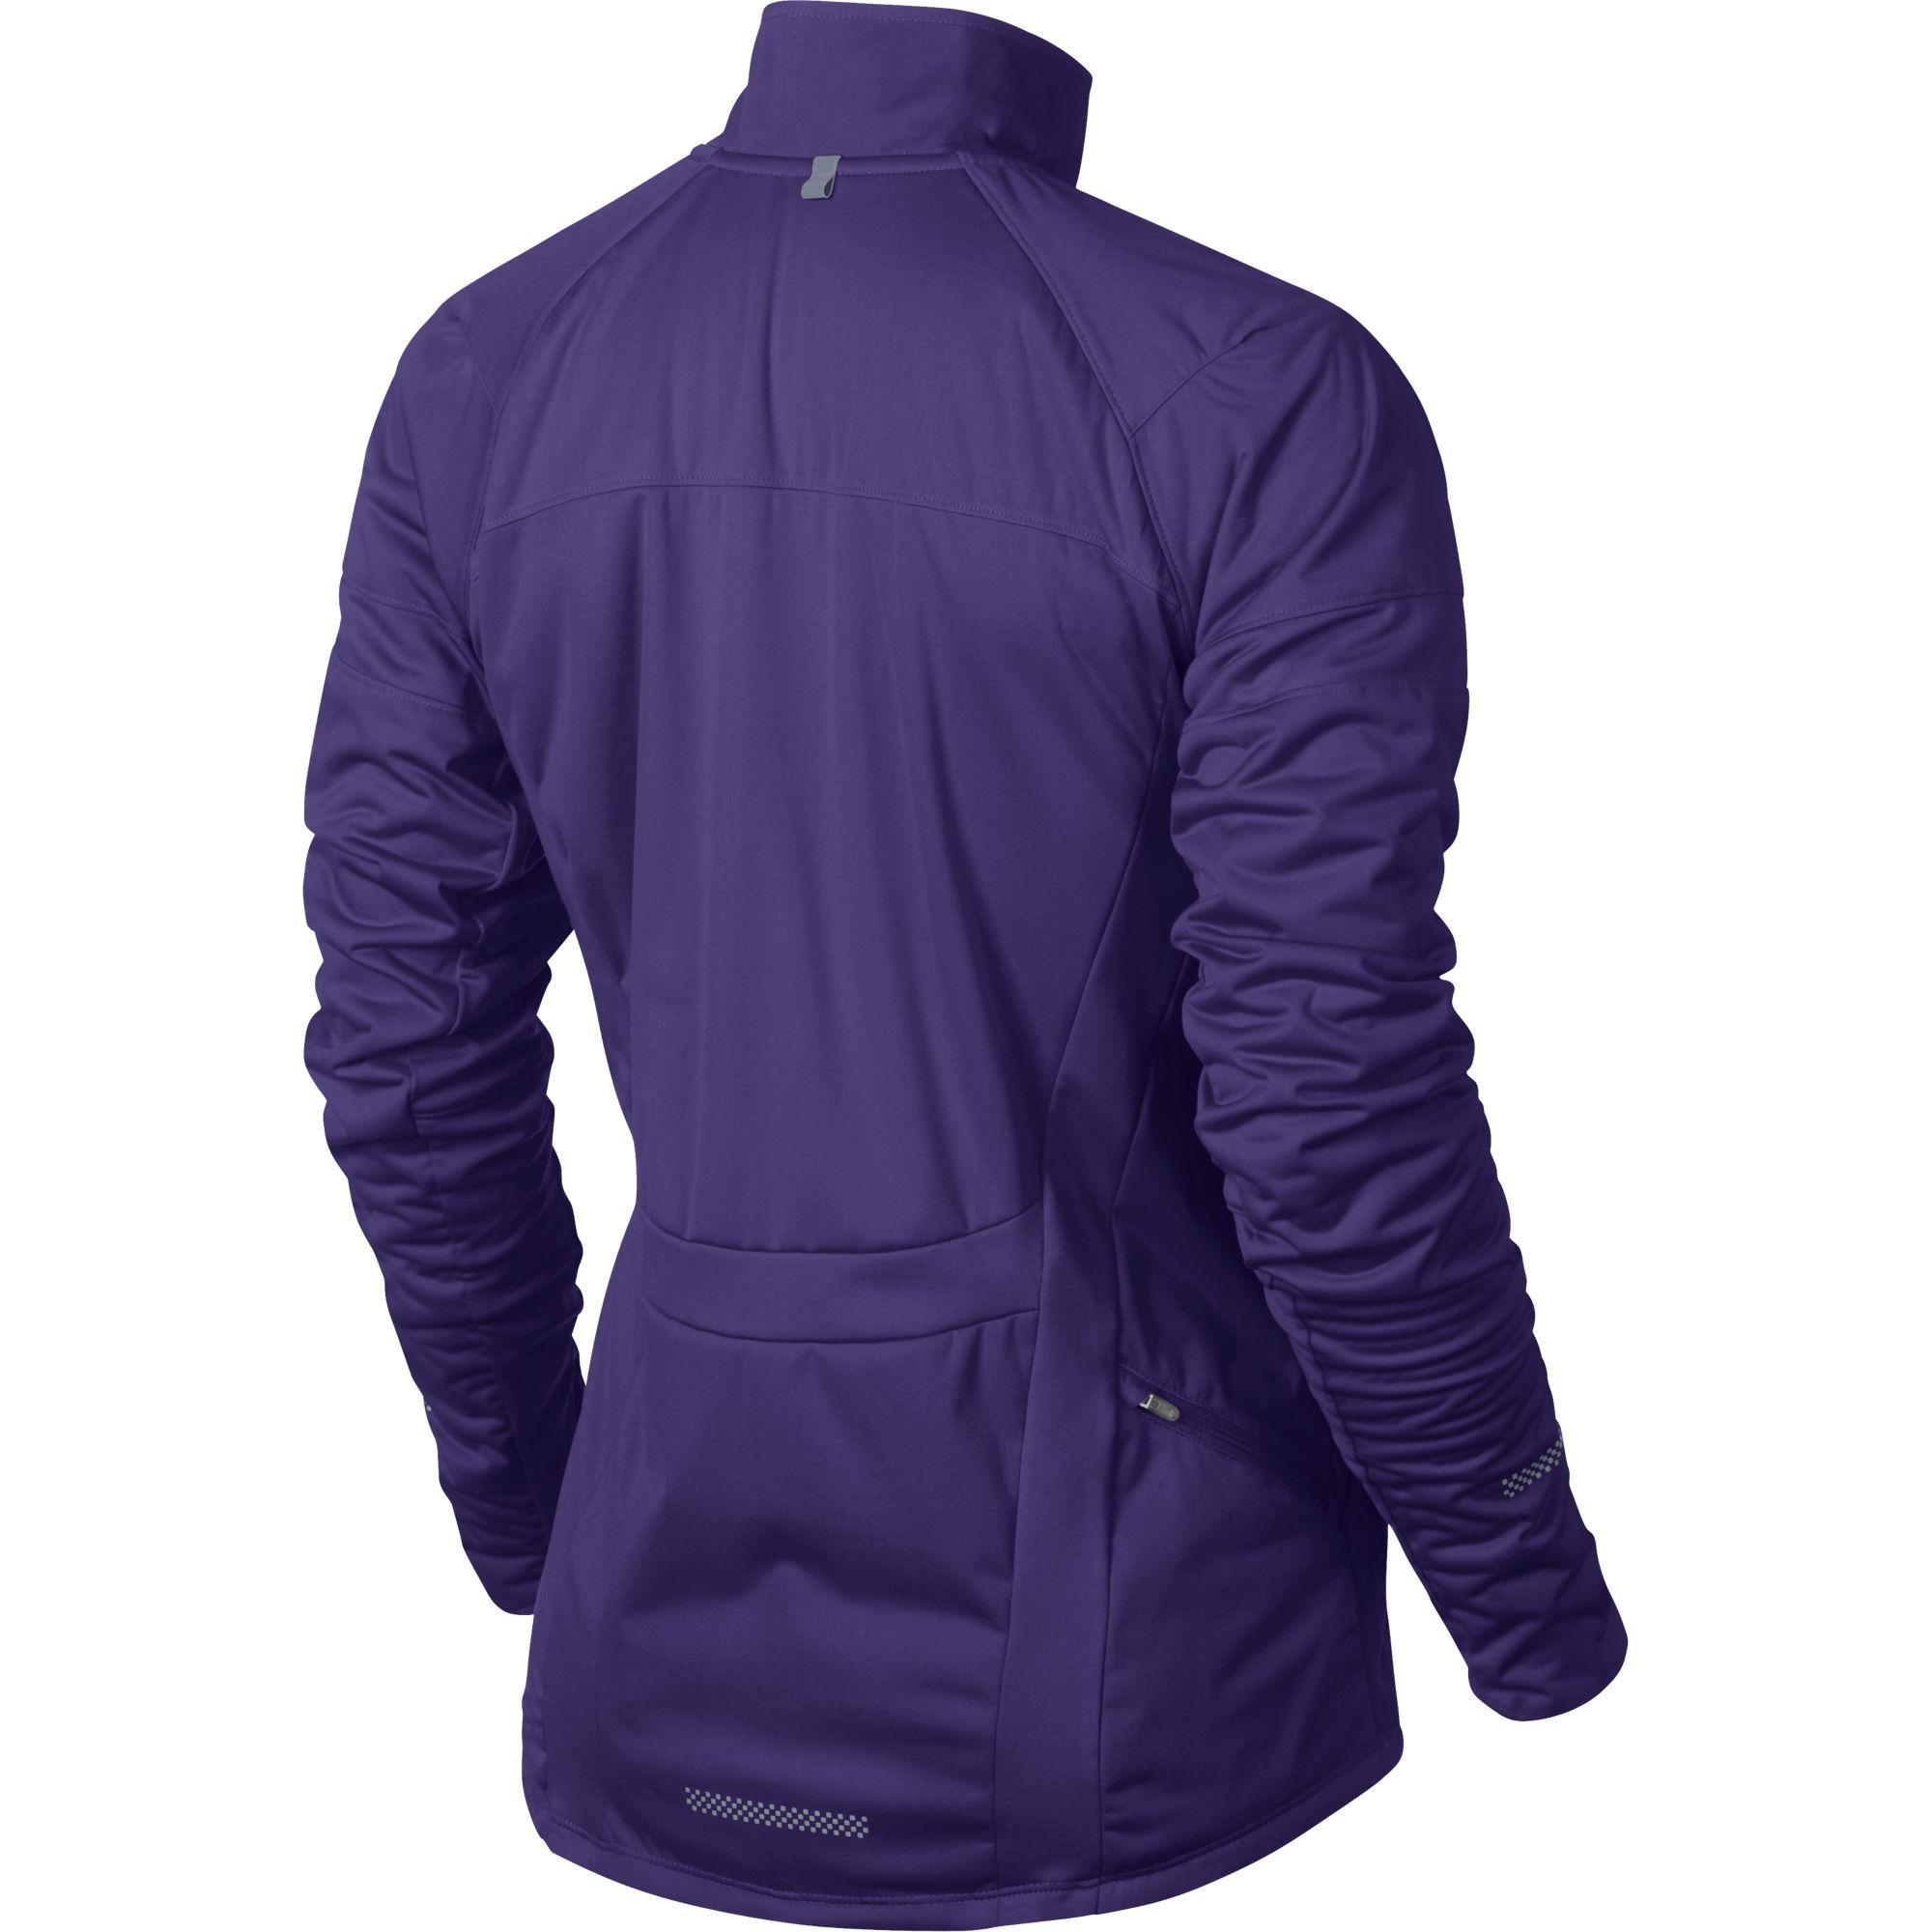 0c8ff1d30da7 Nike Womens Element Shield FZ Jacket - Court Purple Reflective Silver